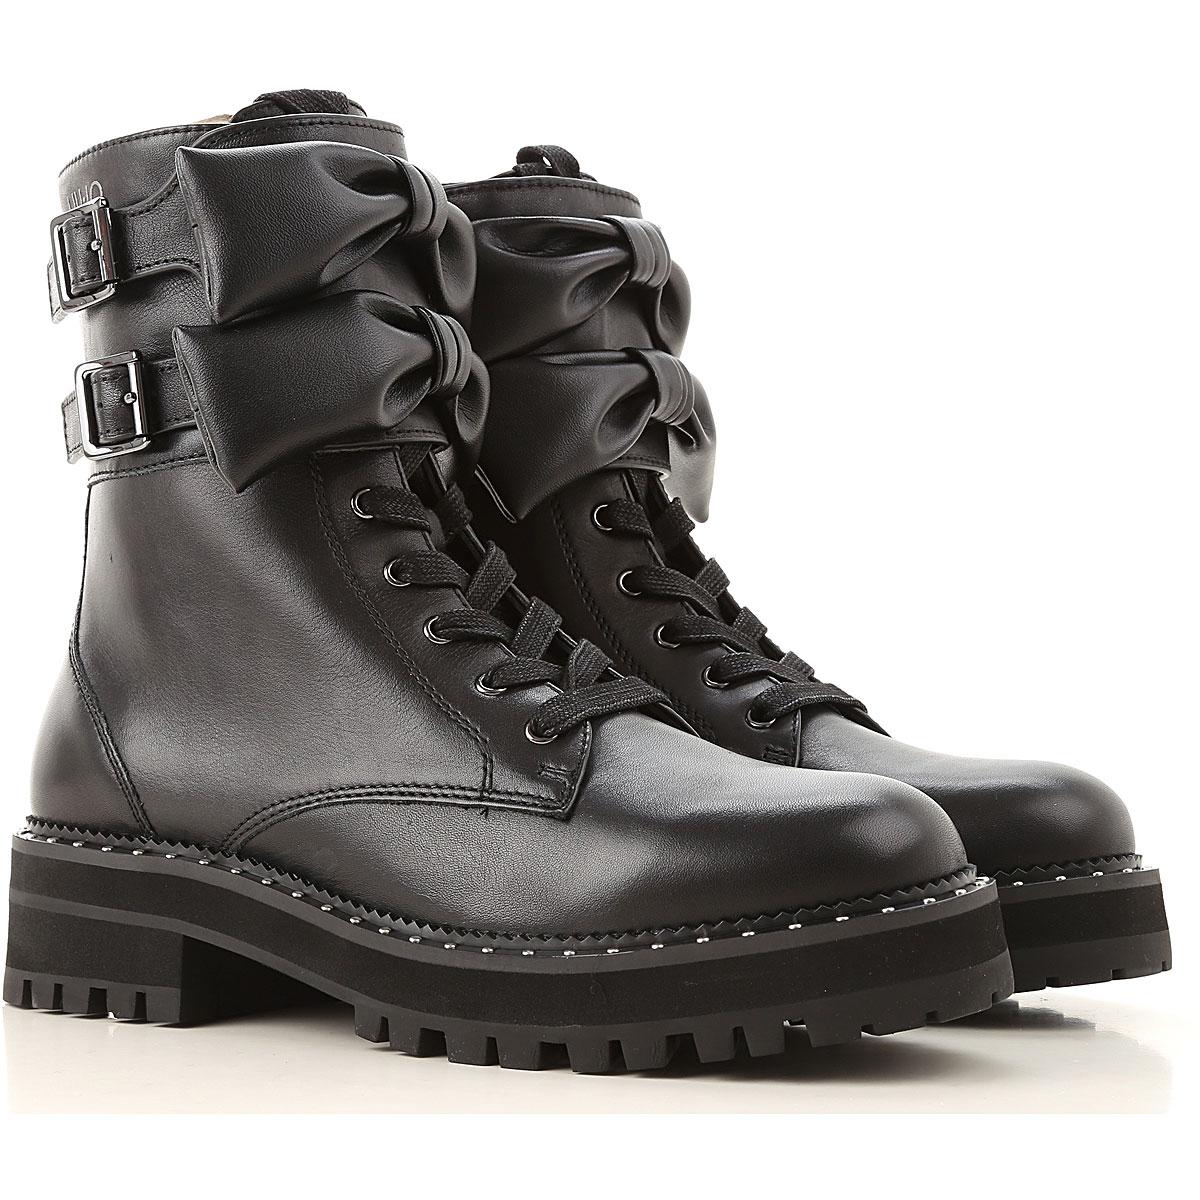 Liu Jo Boots for Women, Booties On Sale, Black, Leather, 2019, 5 6 7 8